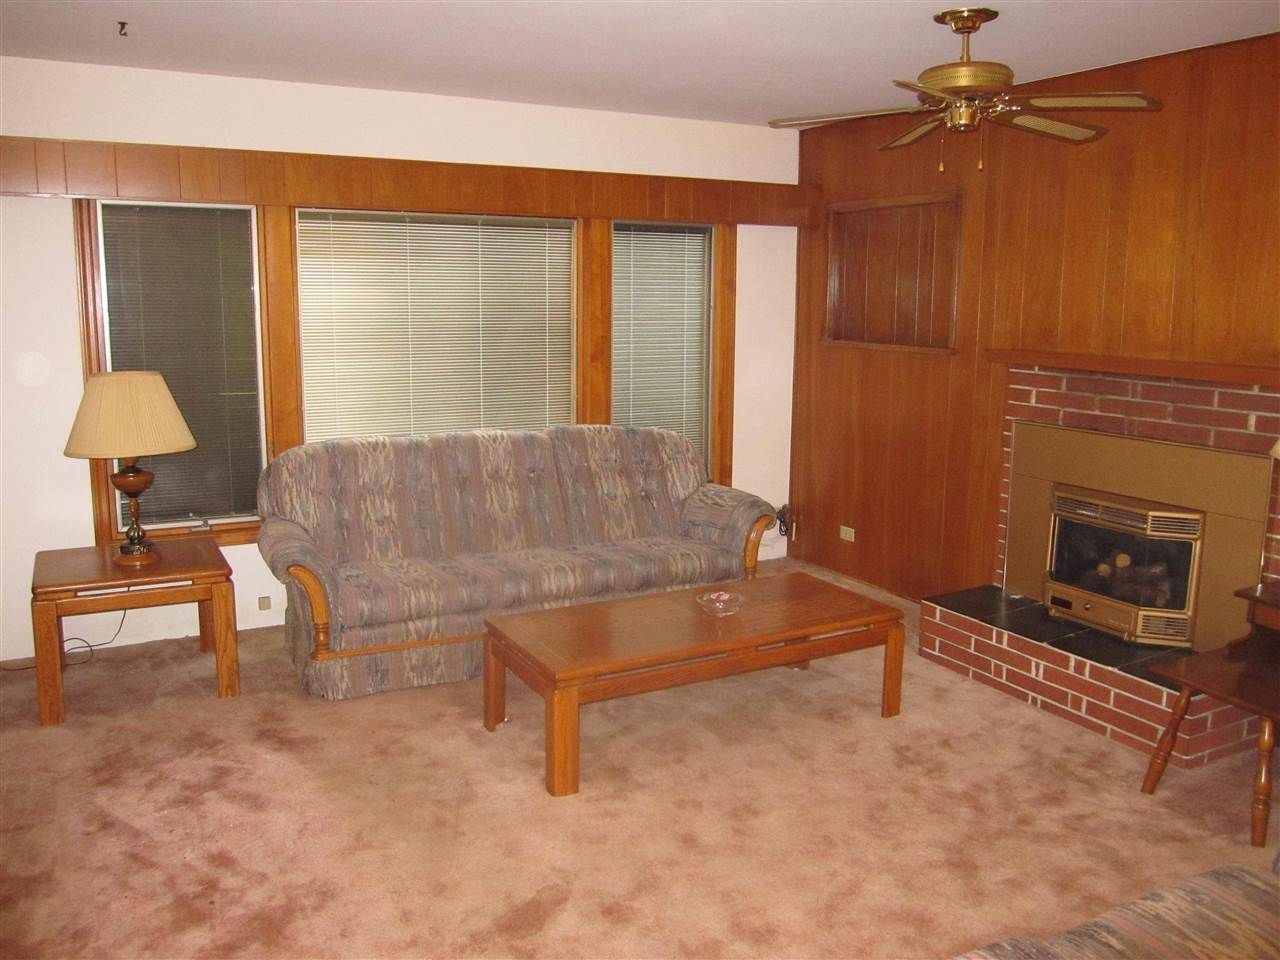 Photo 7: Photos: 11847 267 Street in Maple Ridge: Northeast House for sale : MLS®# R2322069